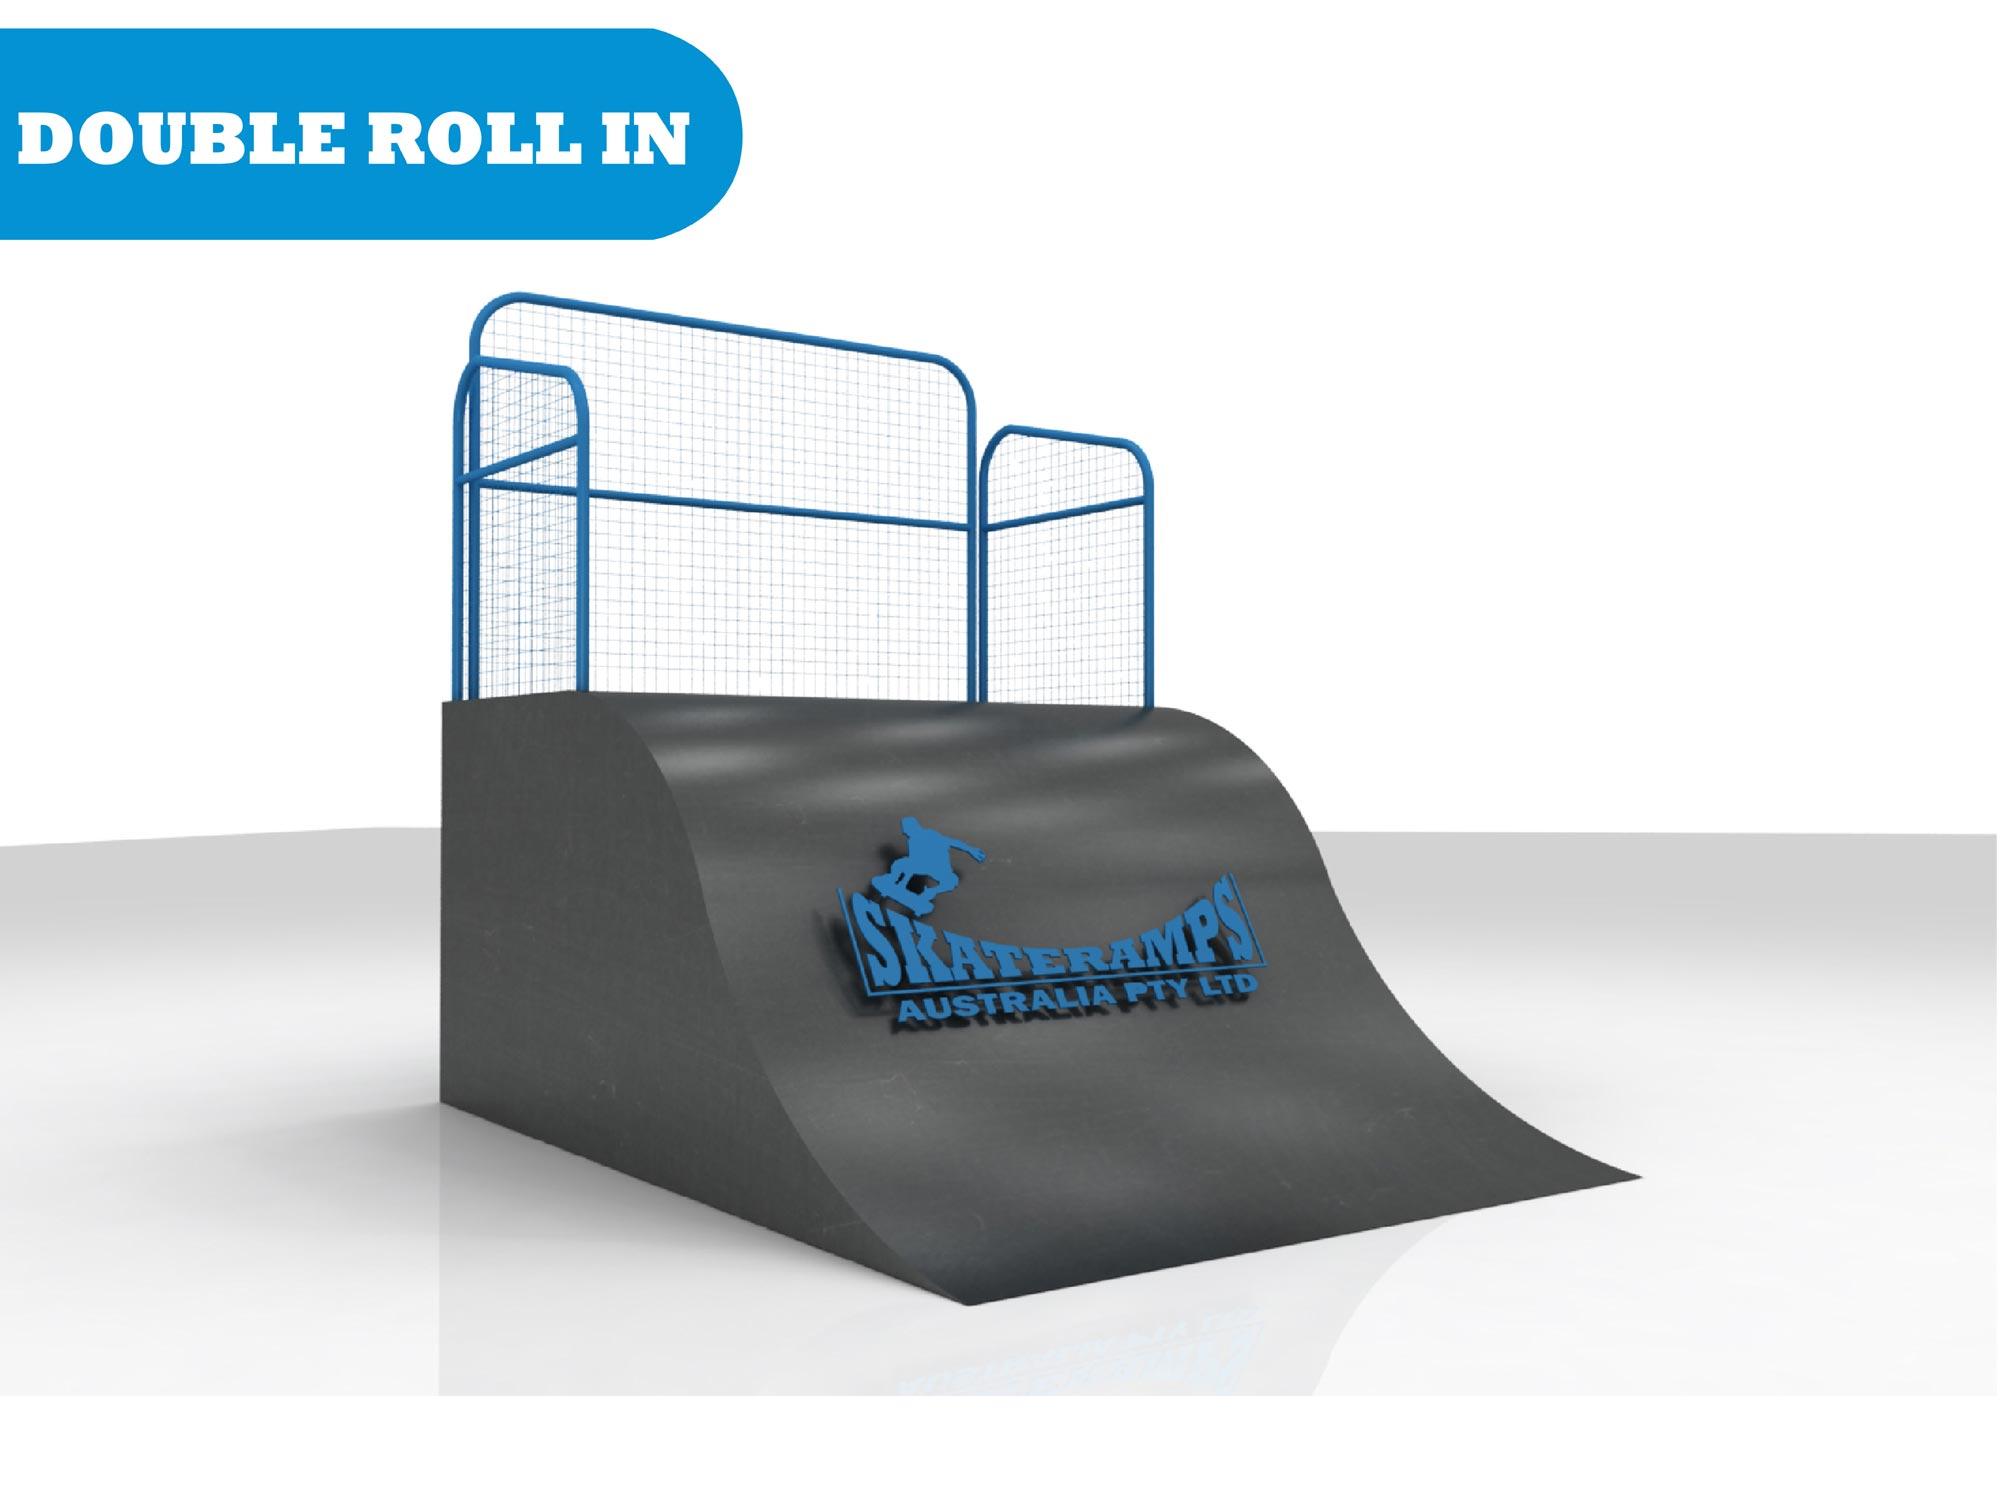 Roll in ramp skate ramp module